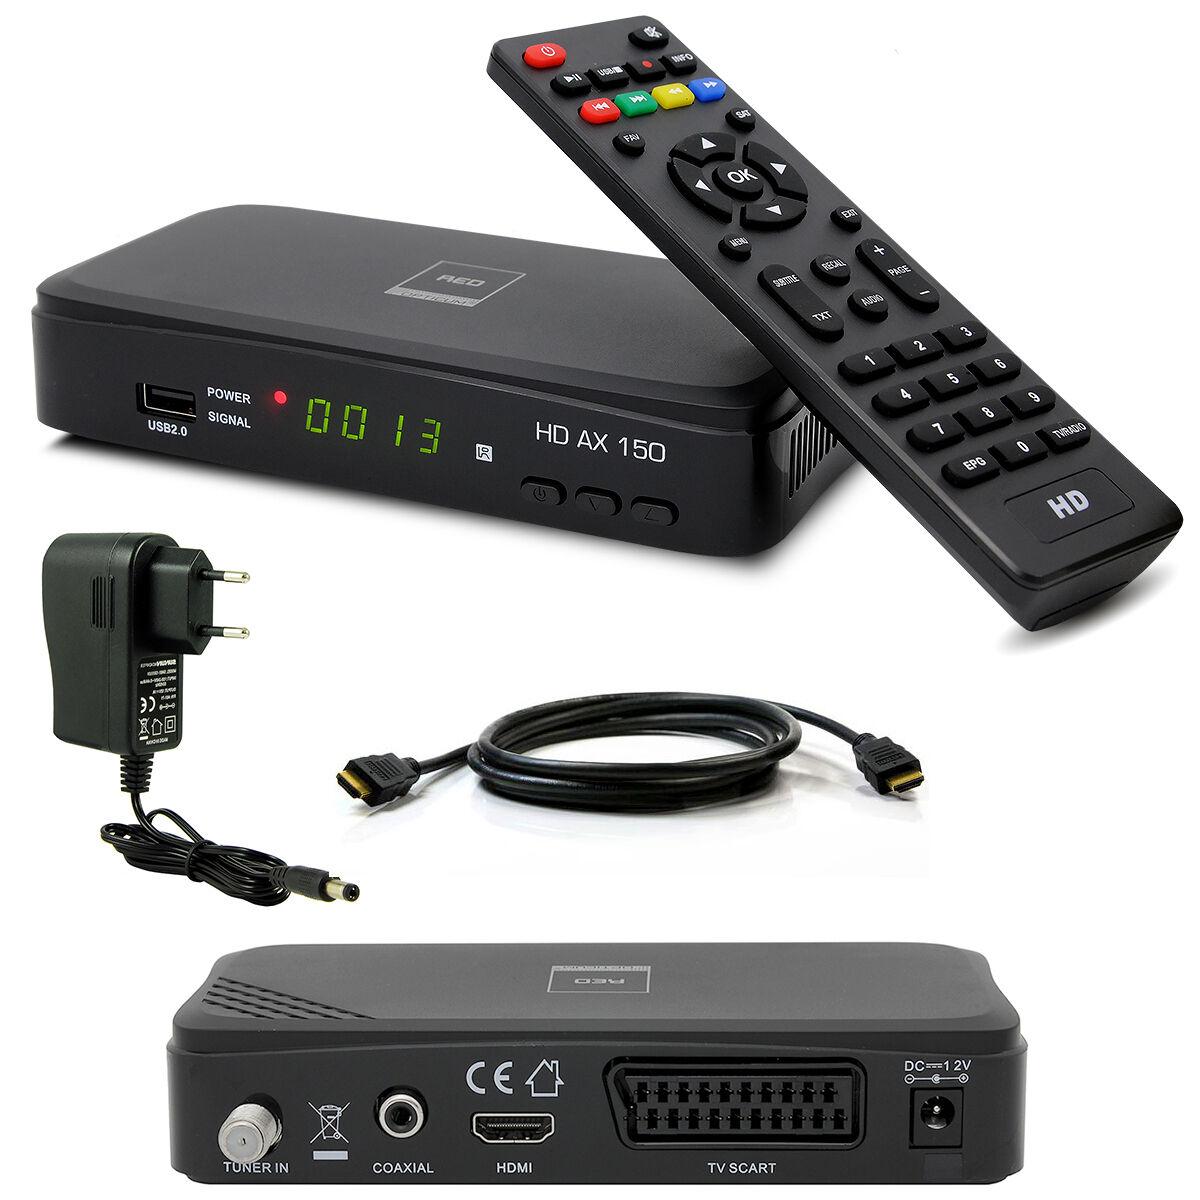 HDTV HD FULL Digital Sat Receiver OPTICUM AX150 AX 150 HDMI DVB-S2 1080p USB S60